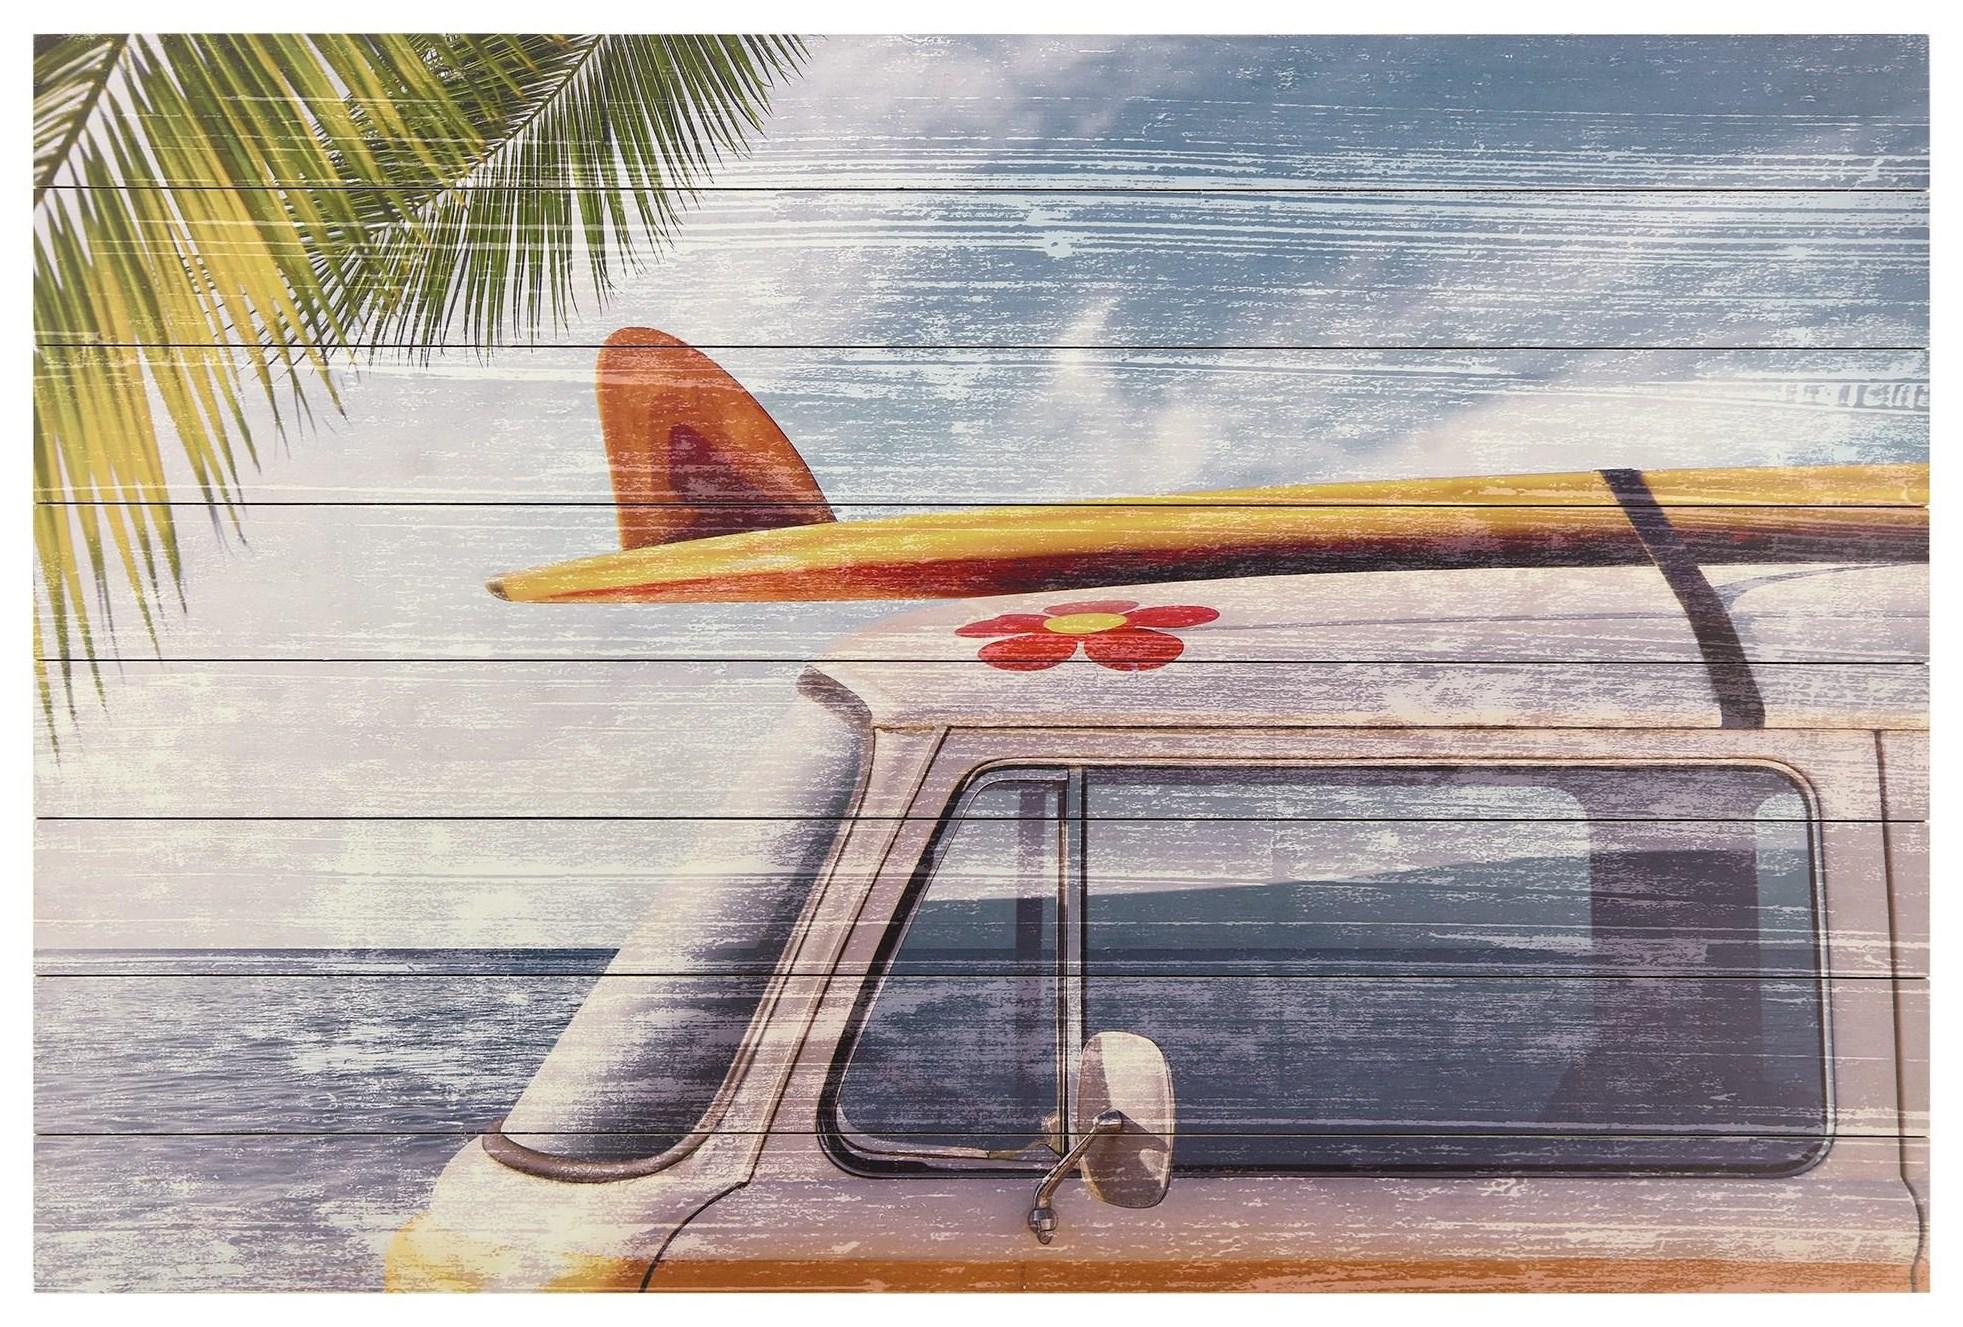 Accessories Beach Bound Planks by Empire Art Direct at HomeWorld Furniture